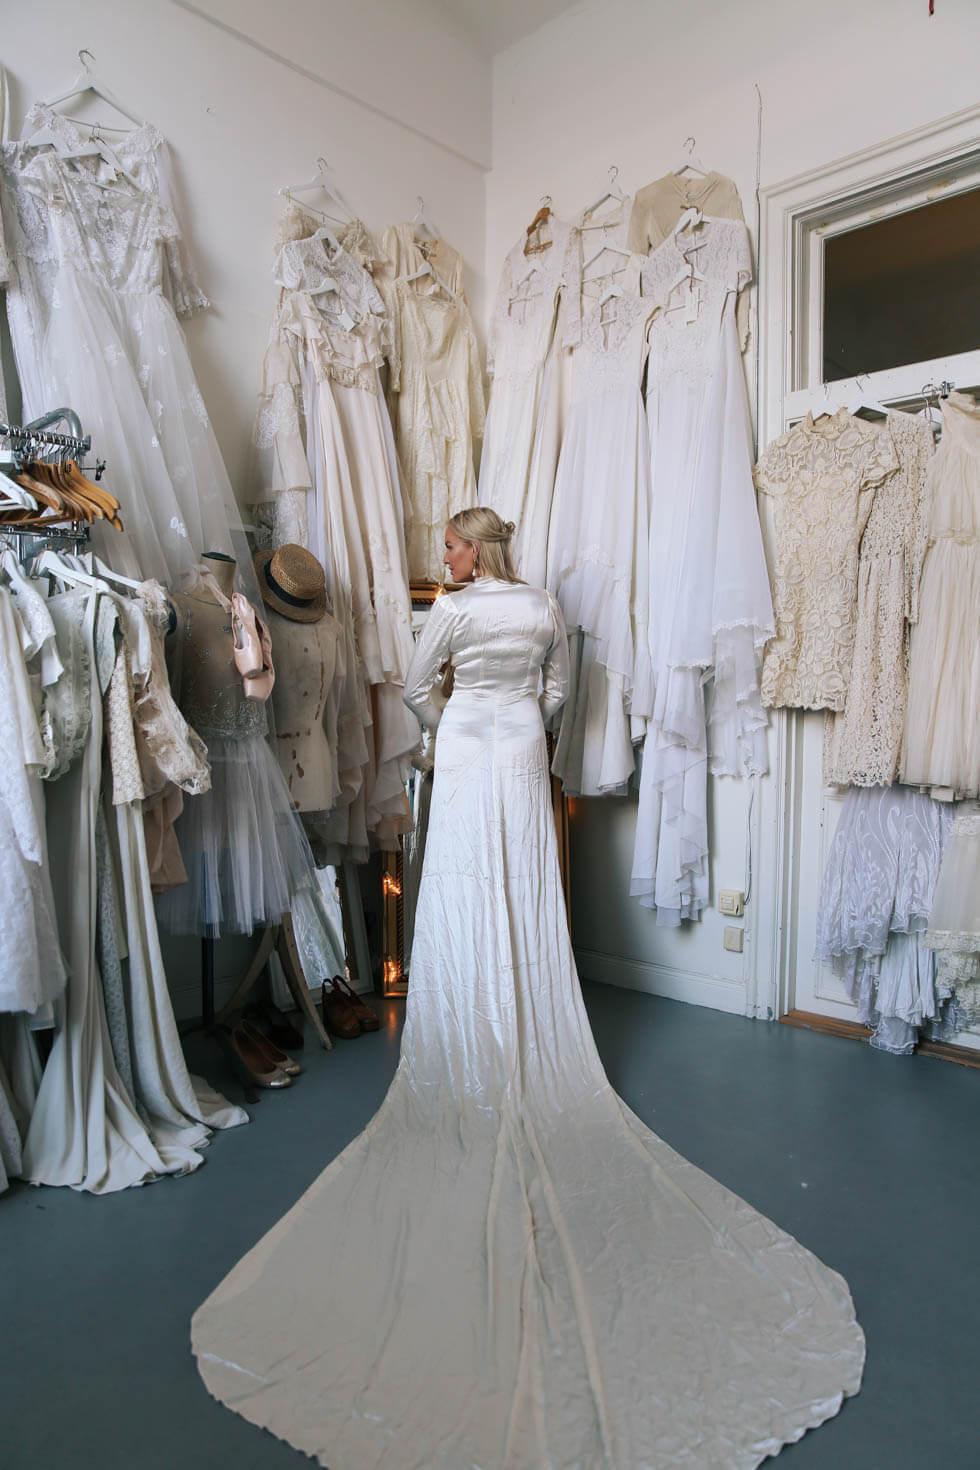 Elsa Billgren Bröllopsklänningar möhippa-23